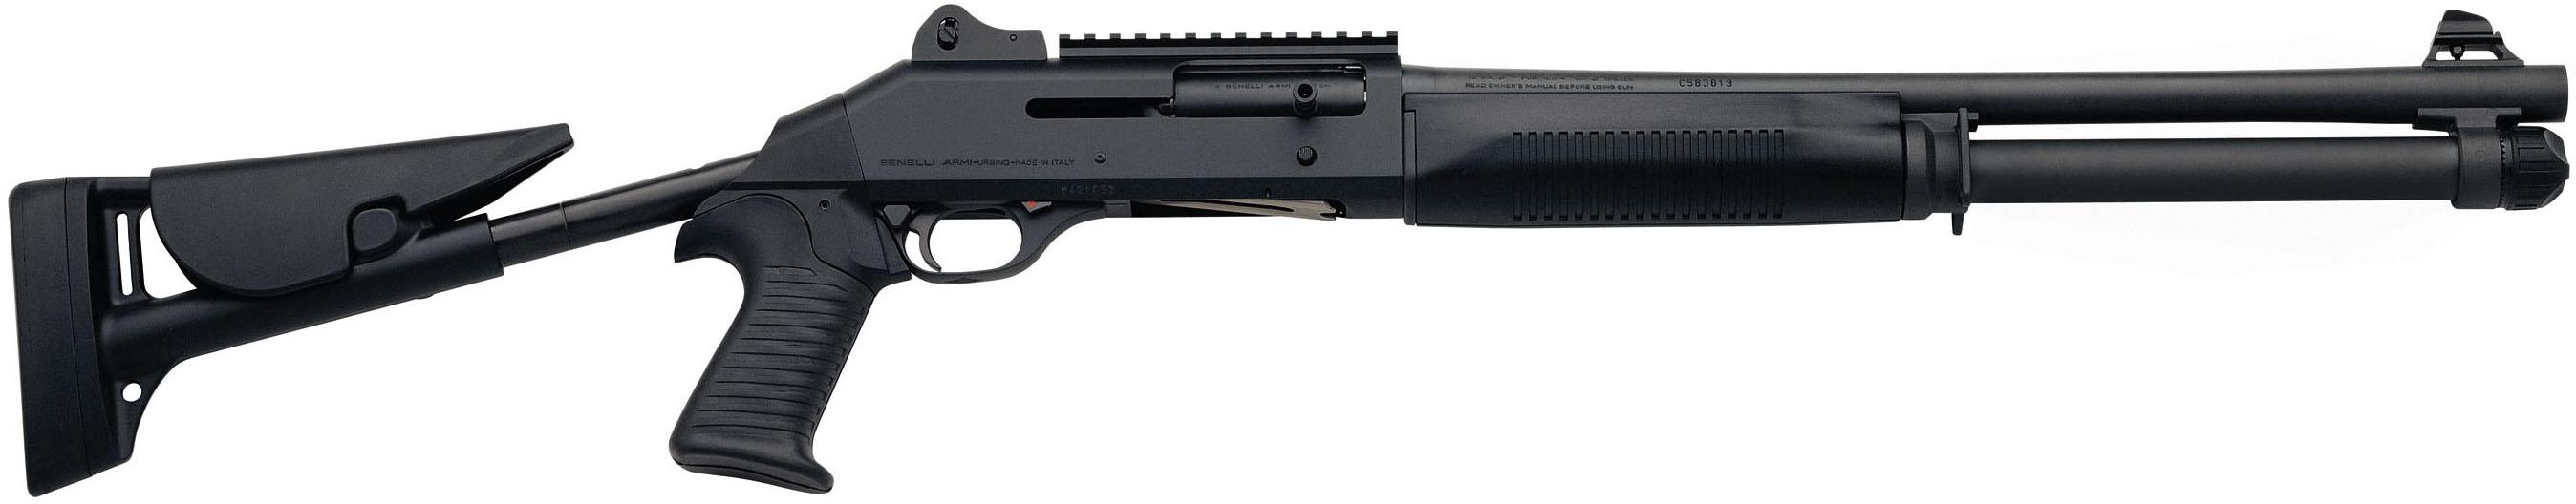 M1014